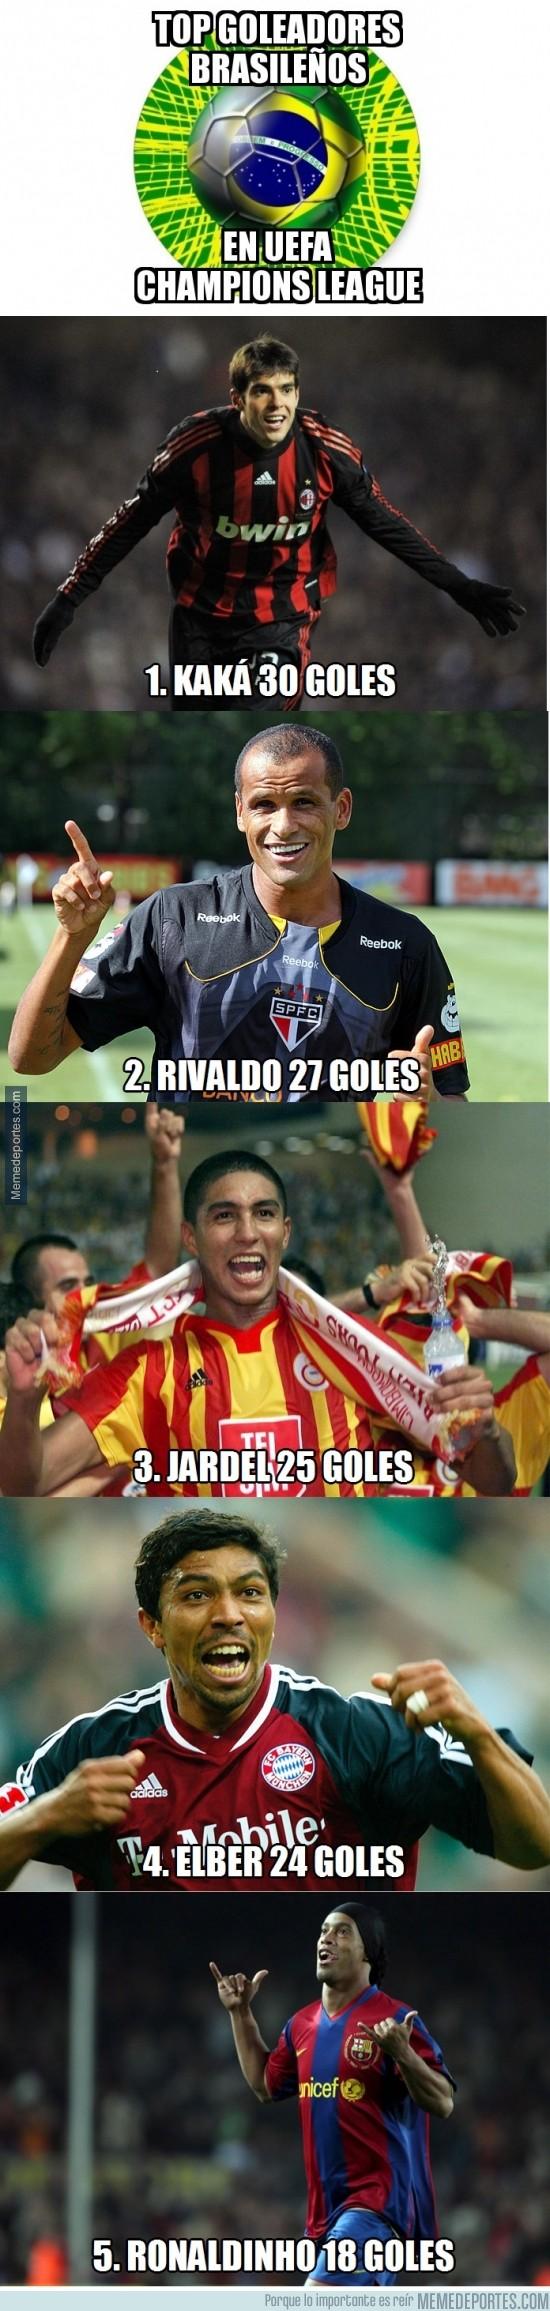 281235 - Top 5 goleadores brasileños en Champions League